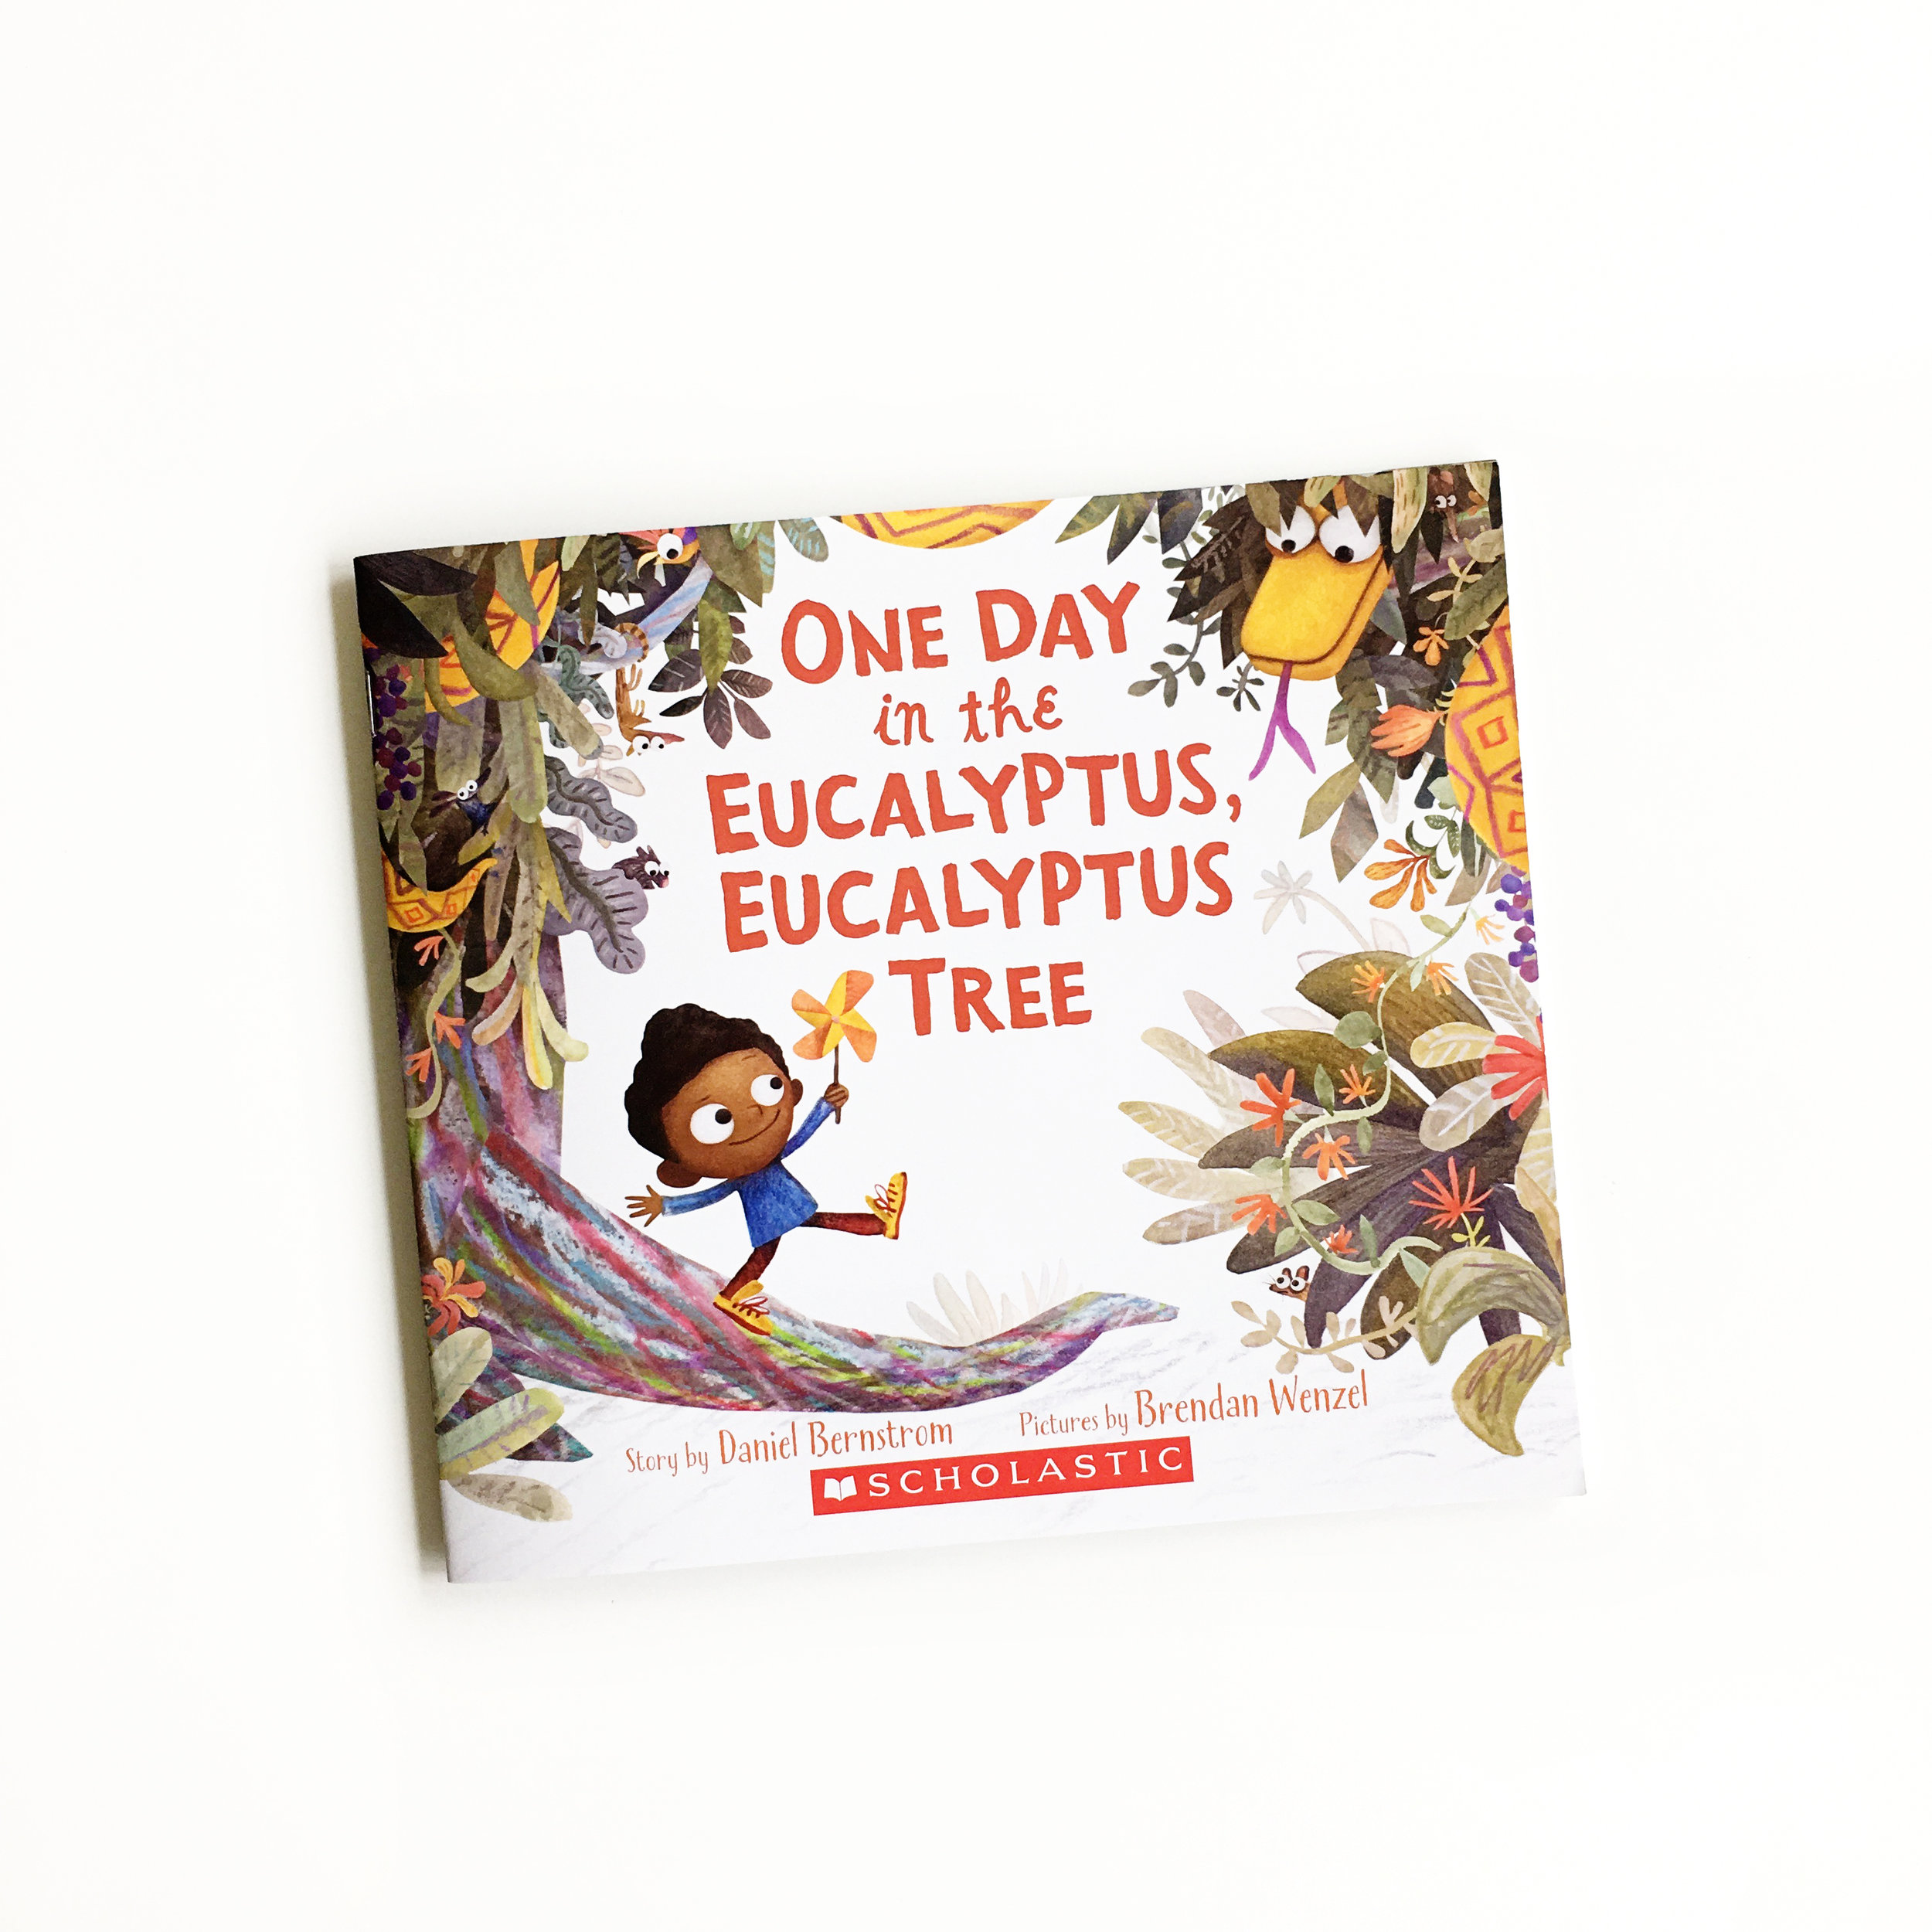 One Day in the Eucalyptus, Eucalyptus Tree | Little Lit Book Series